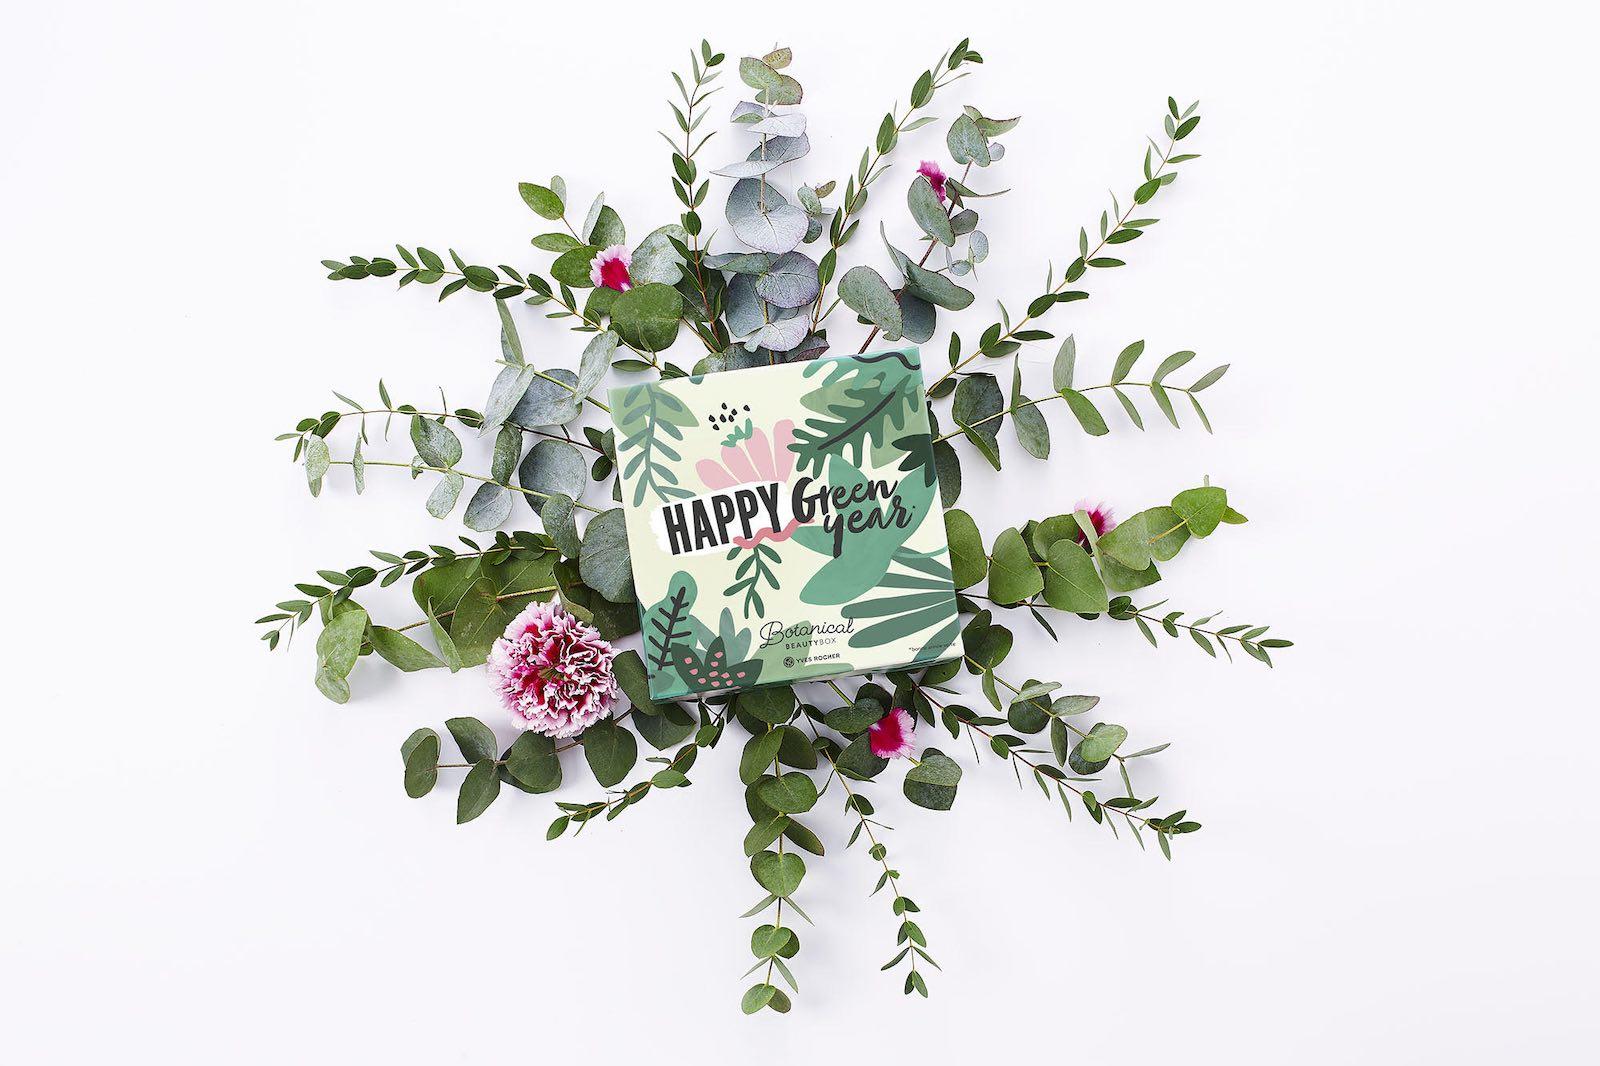 Yves Rocher Botanical Beauty Box Happy Green Year Janvier 2019